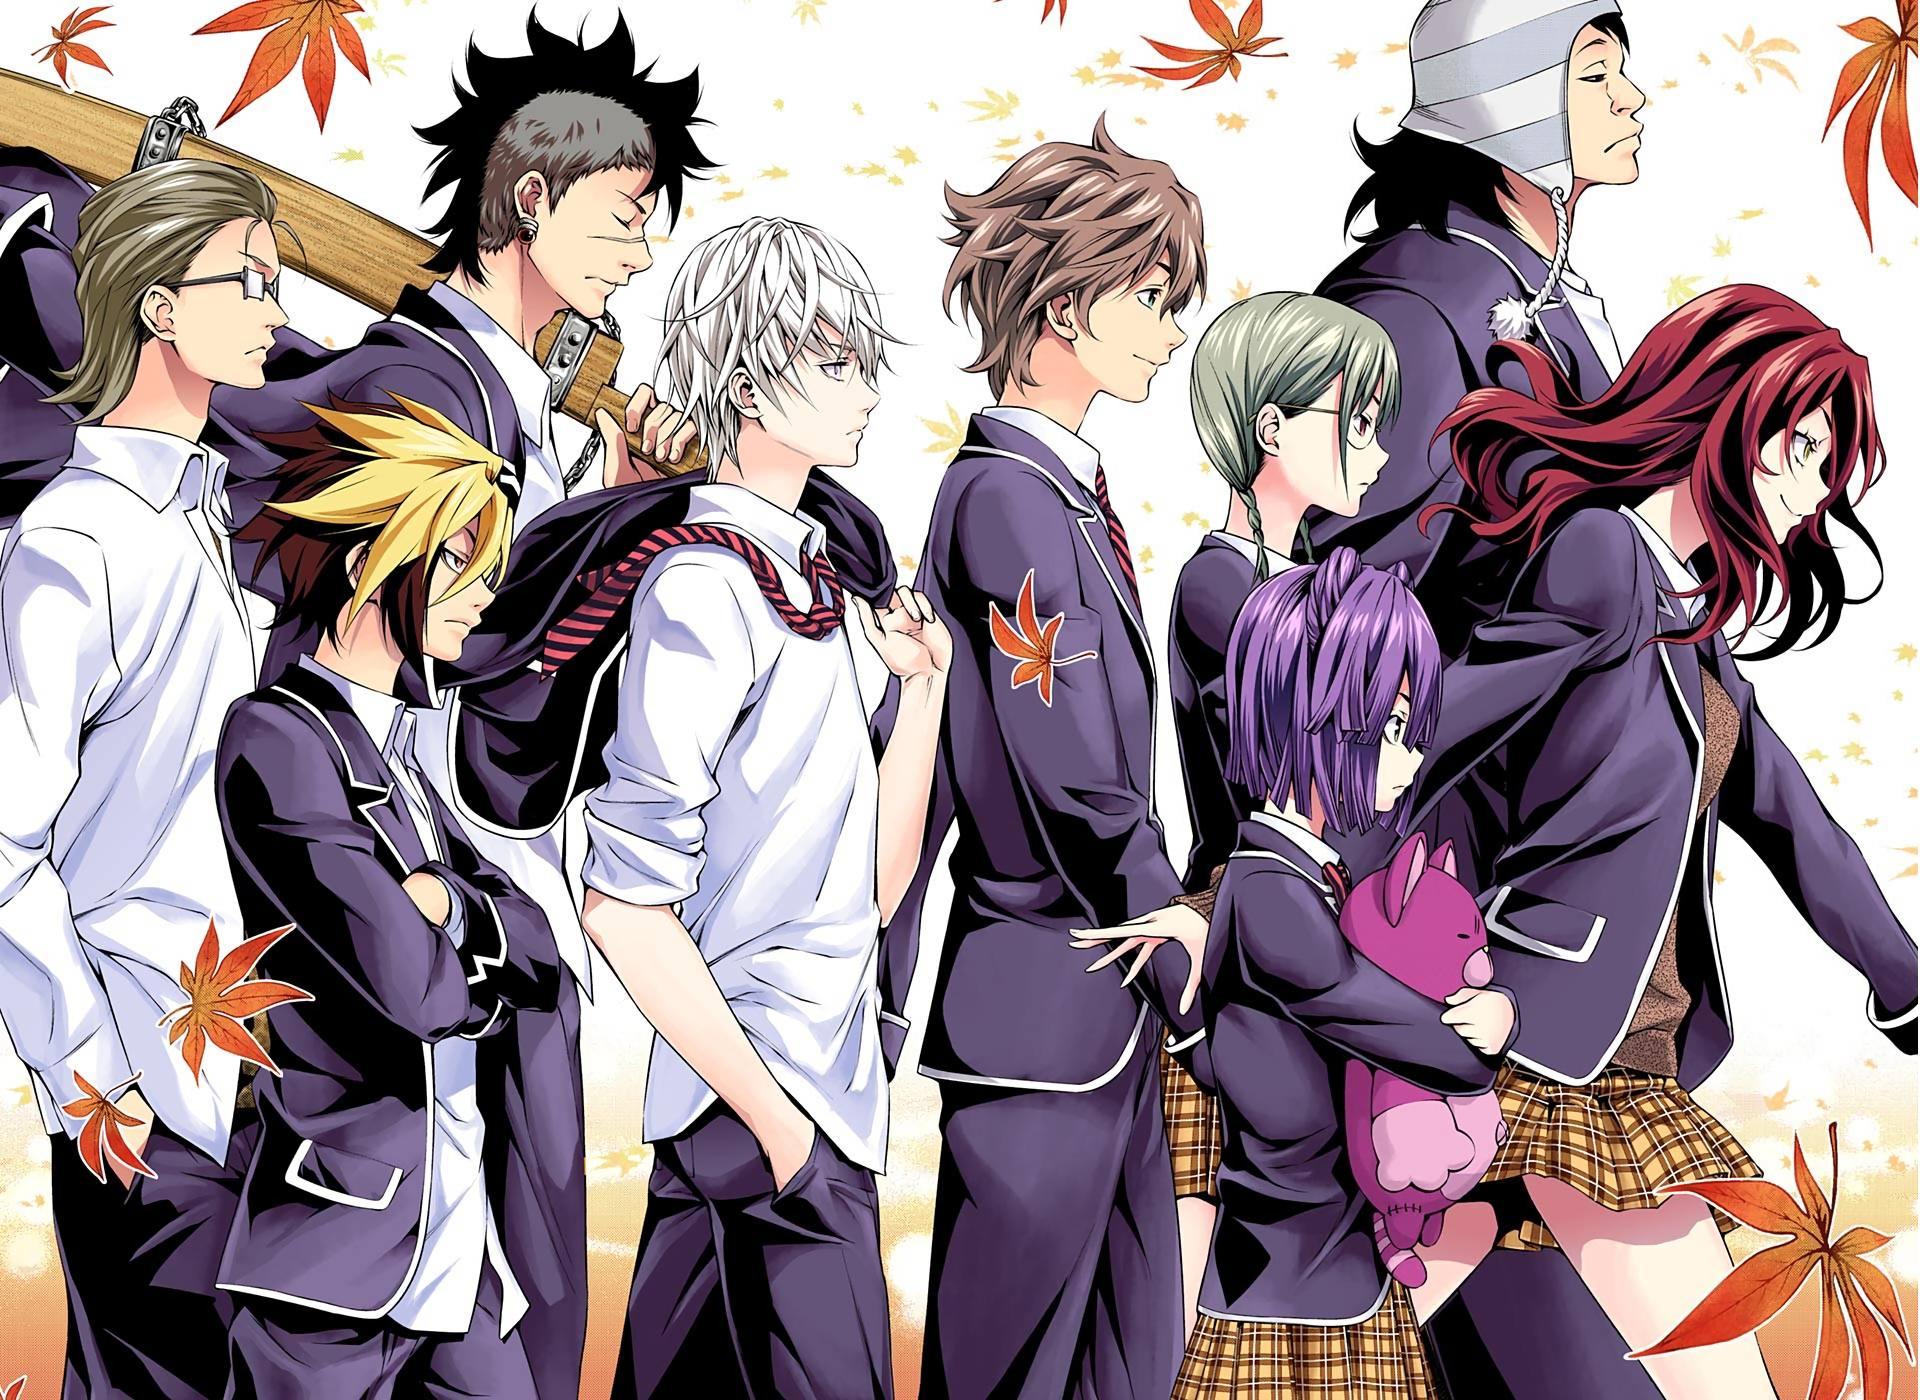 Food Wars Shokugeki No Soma Hd Wallpapers Backgrounds Isshiki Satoshi Watch Manga